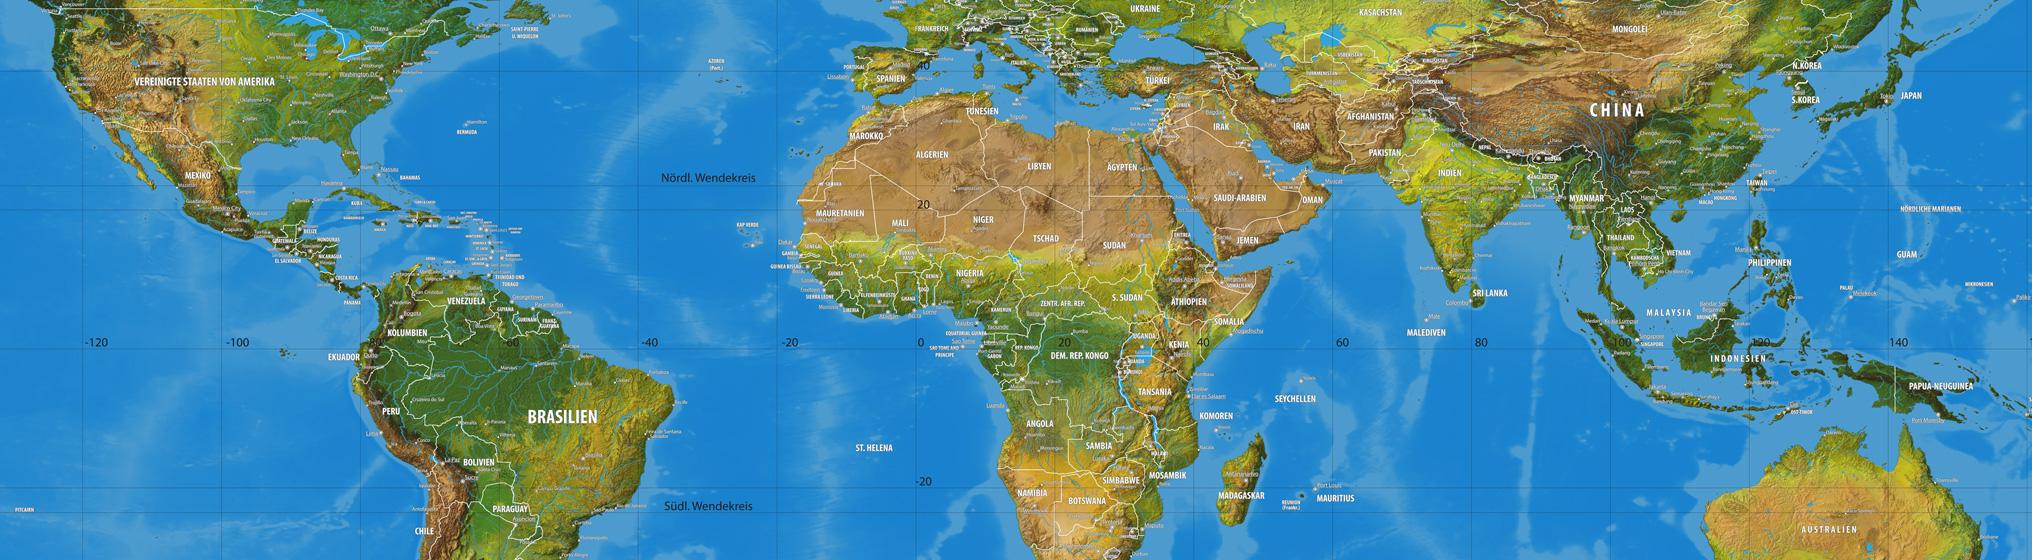 Weltkarte für Globus